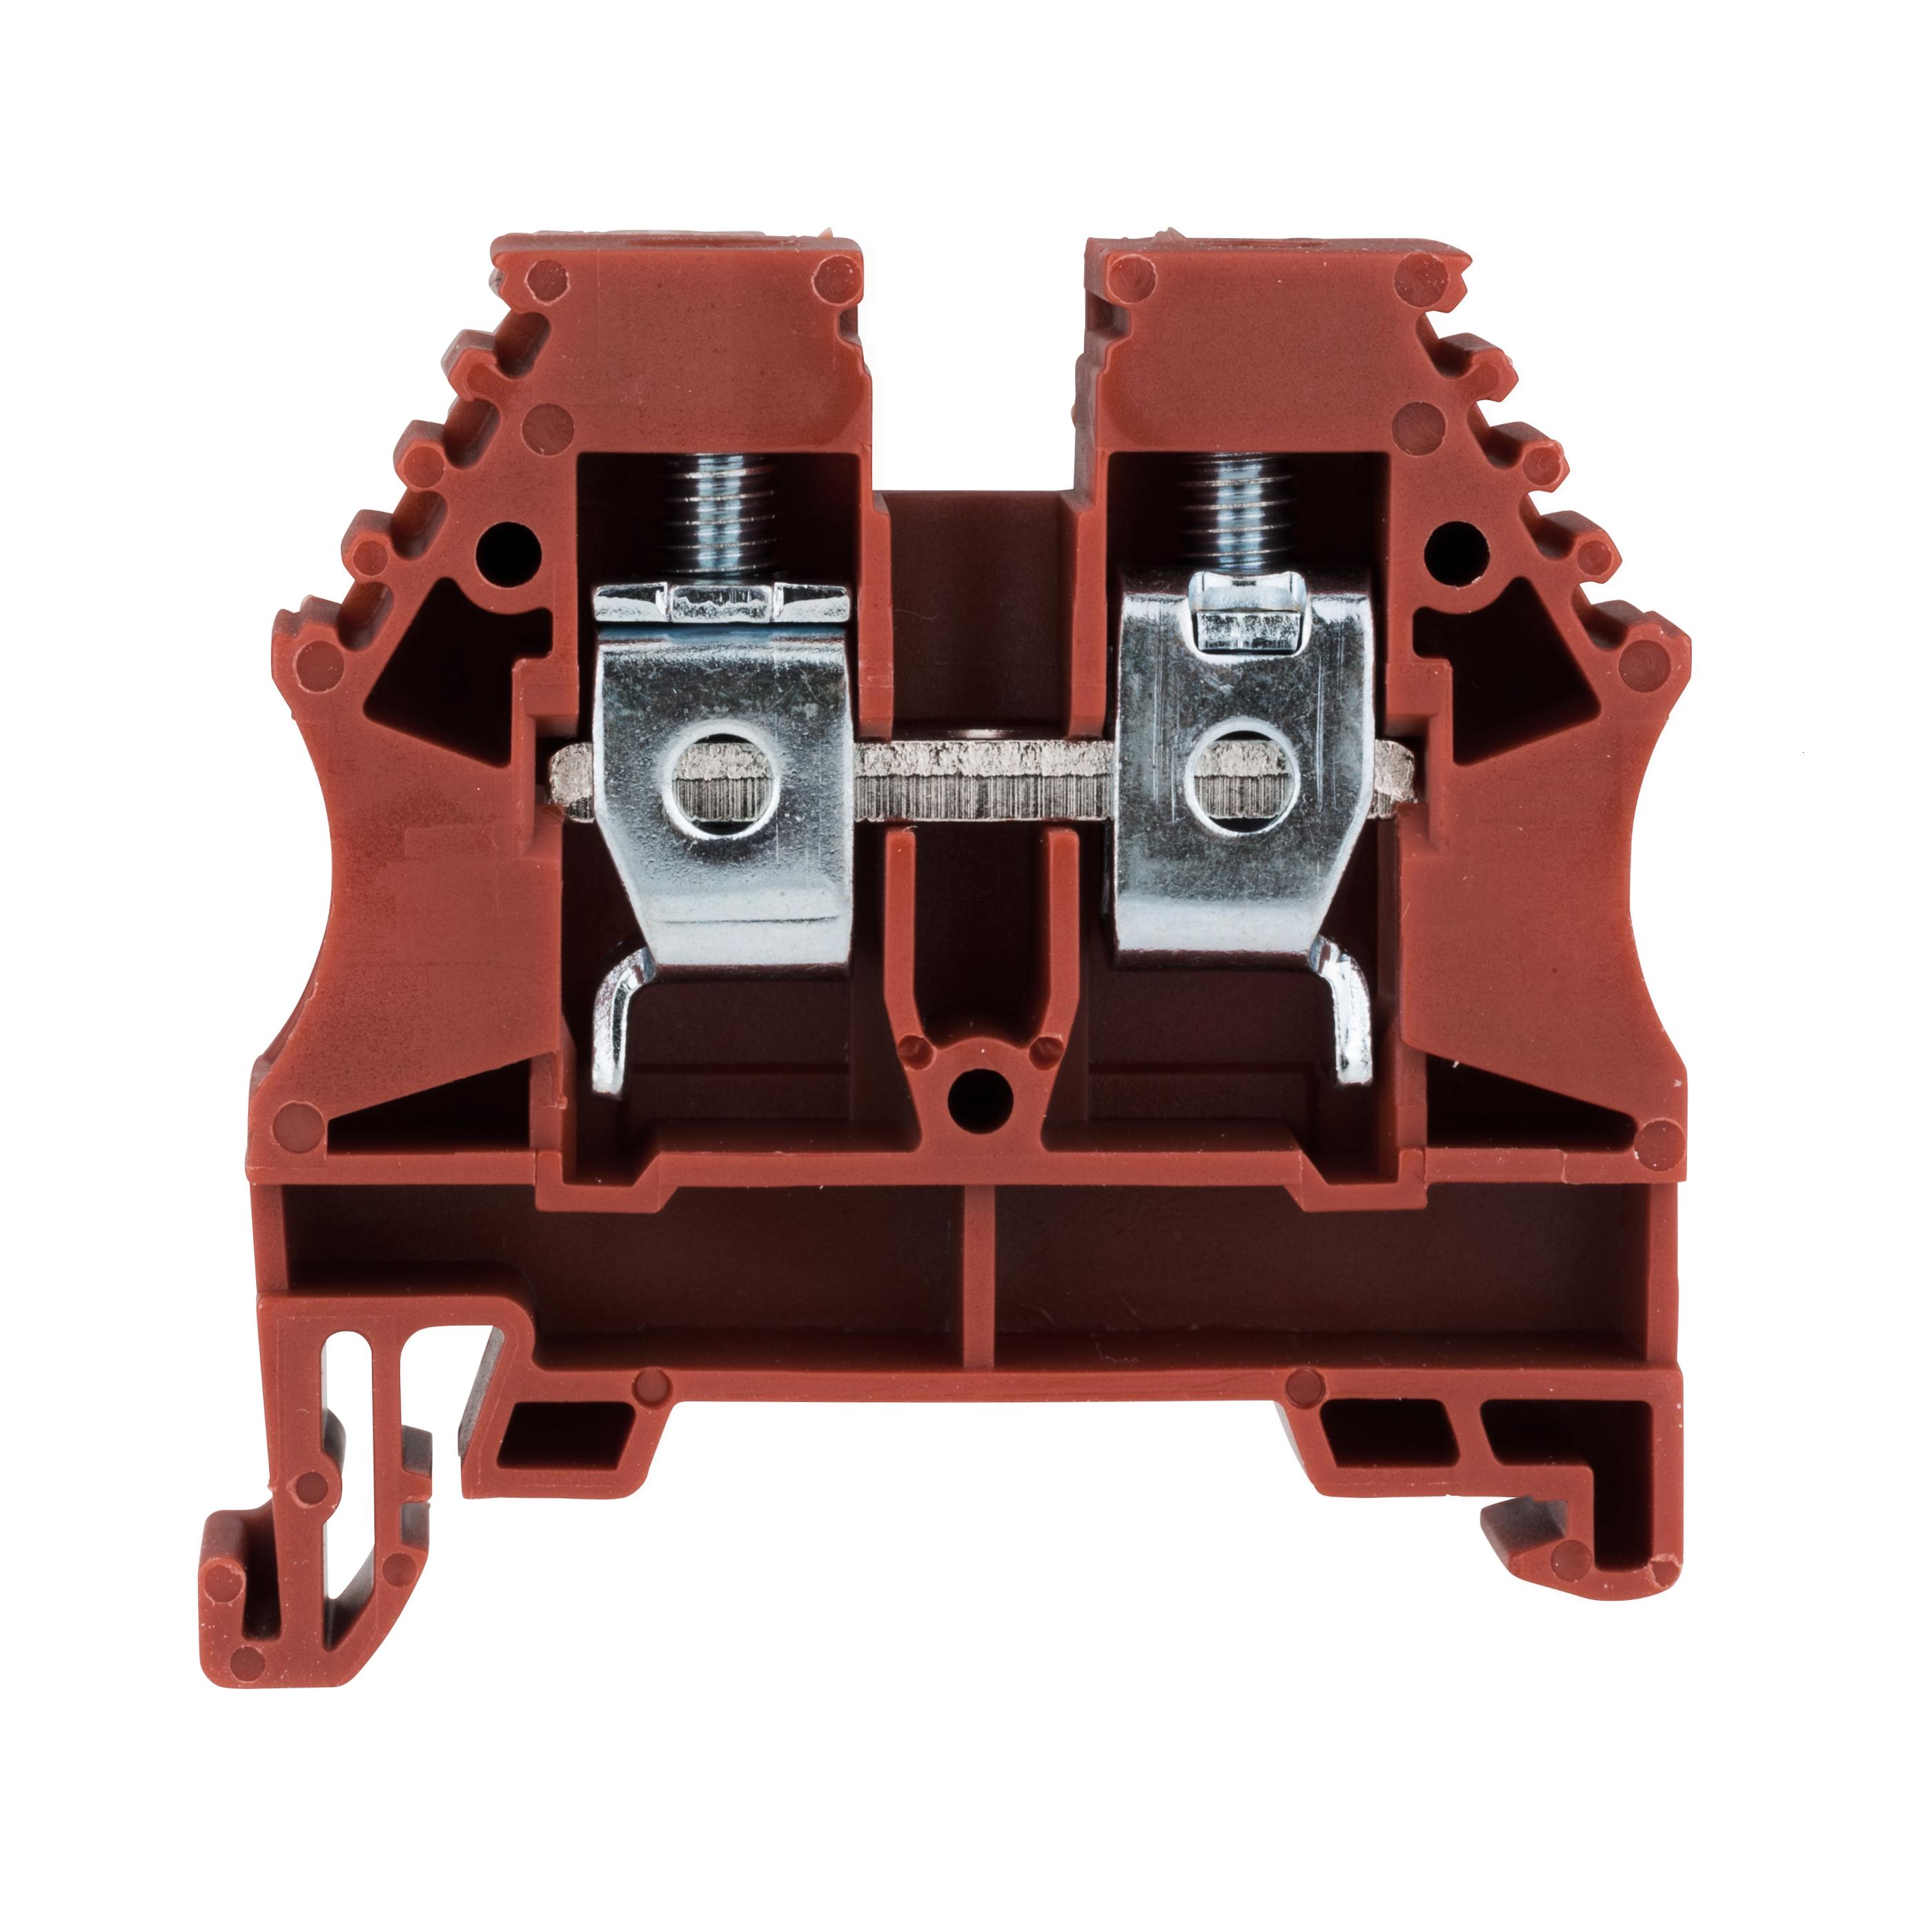 1 Stk Reihenklemme 10mm², Type AVK 10, rot IK608010--